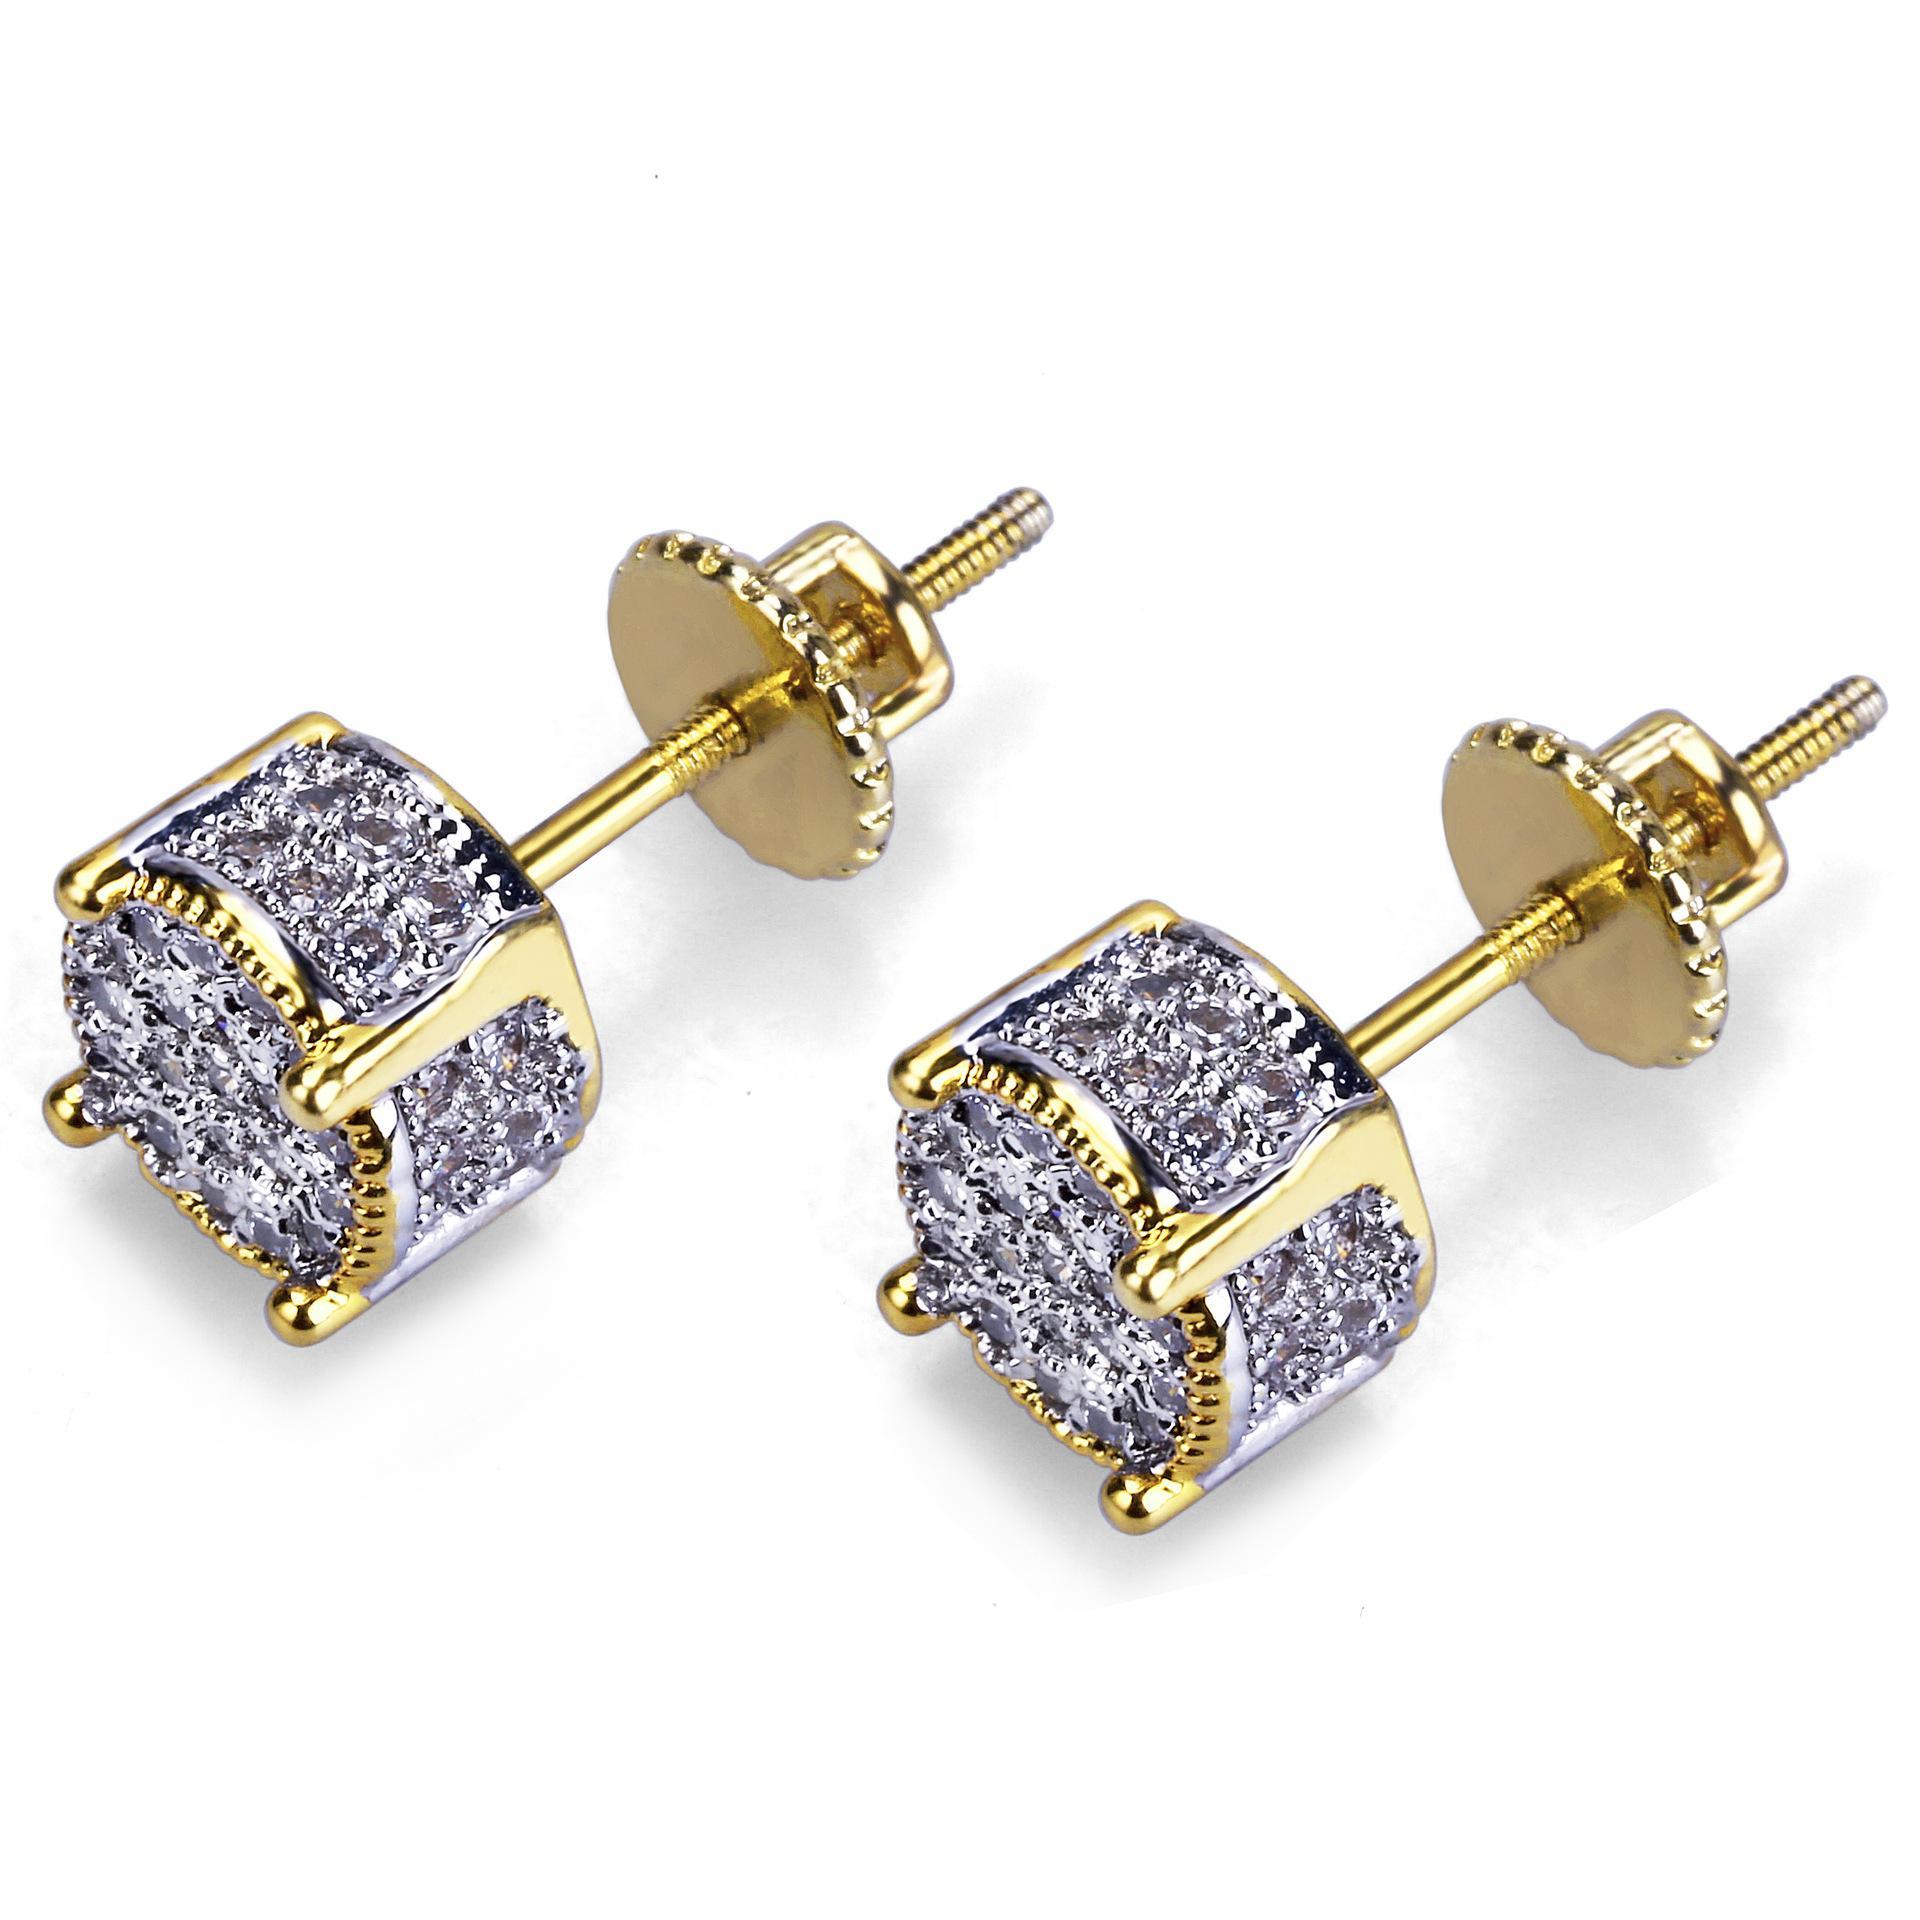 Хип-хоп Рок Jewelry серьги цвета золота Iced Out Micro Pave CZ камень Lab серьги с винтовым Назад Gor Мужчины Женщины